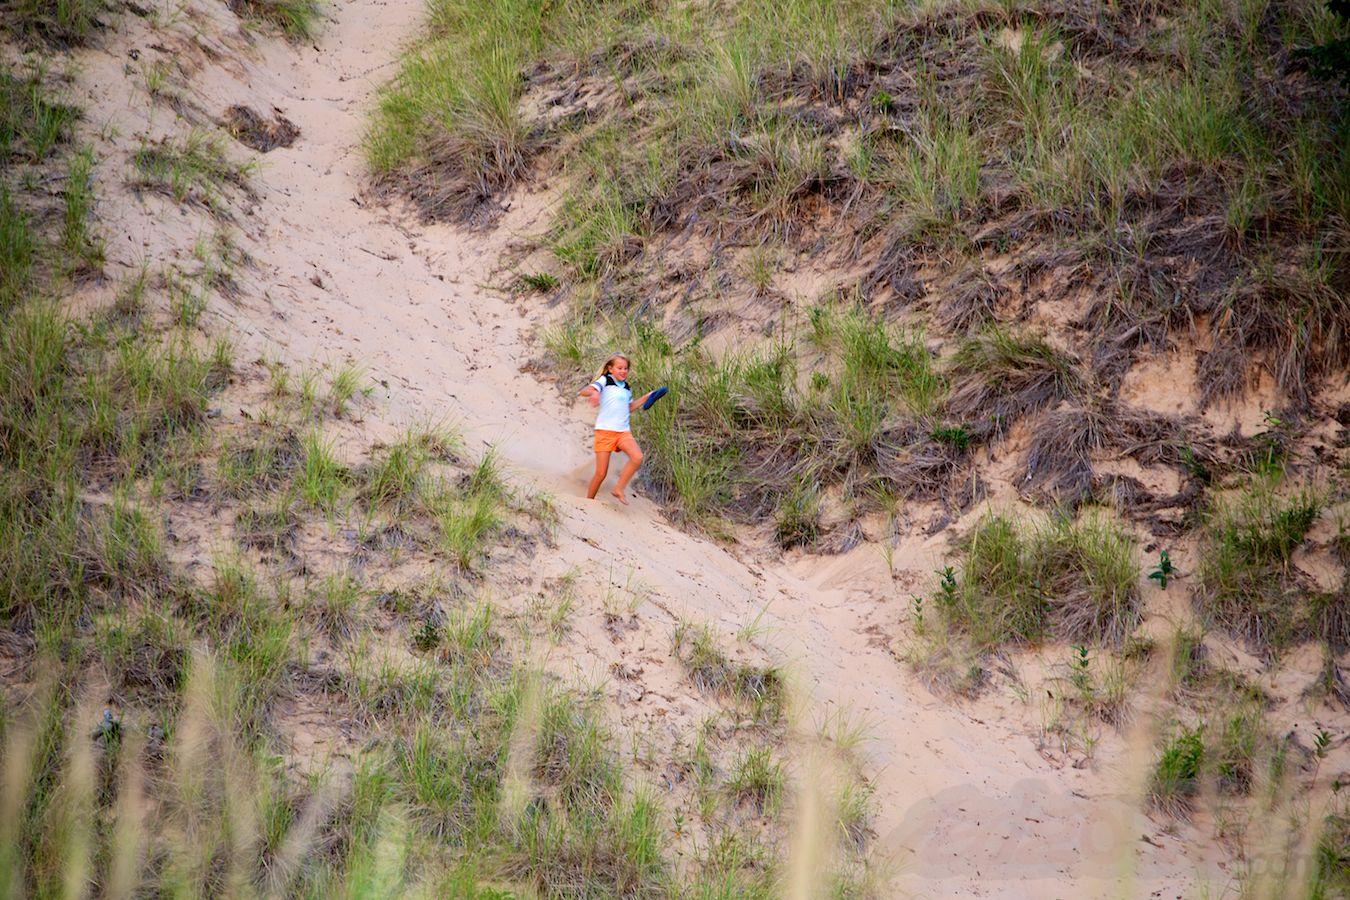 Saugatuck Dunes State Park